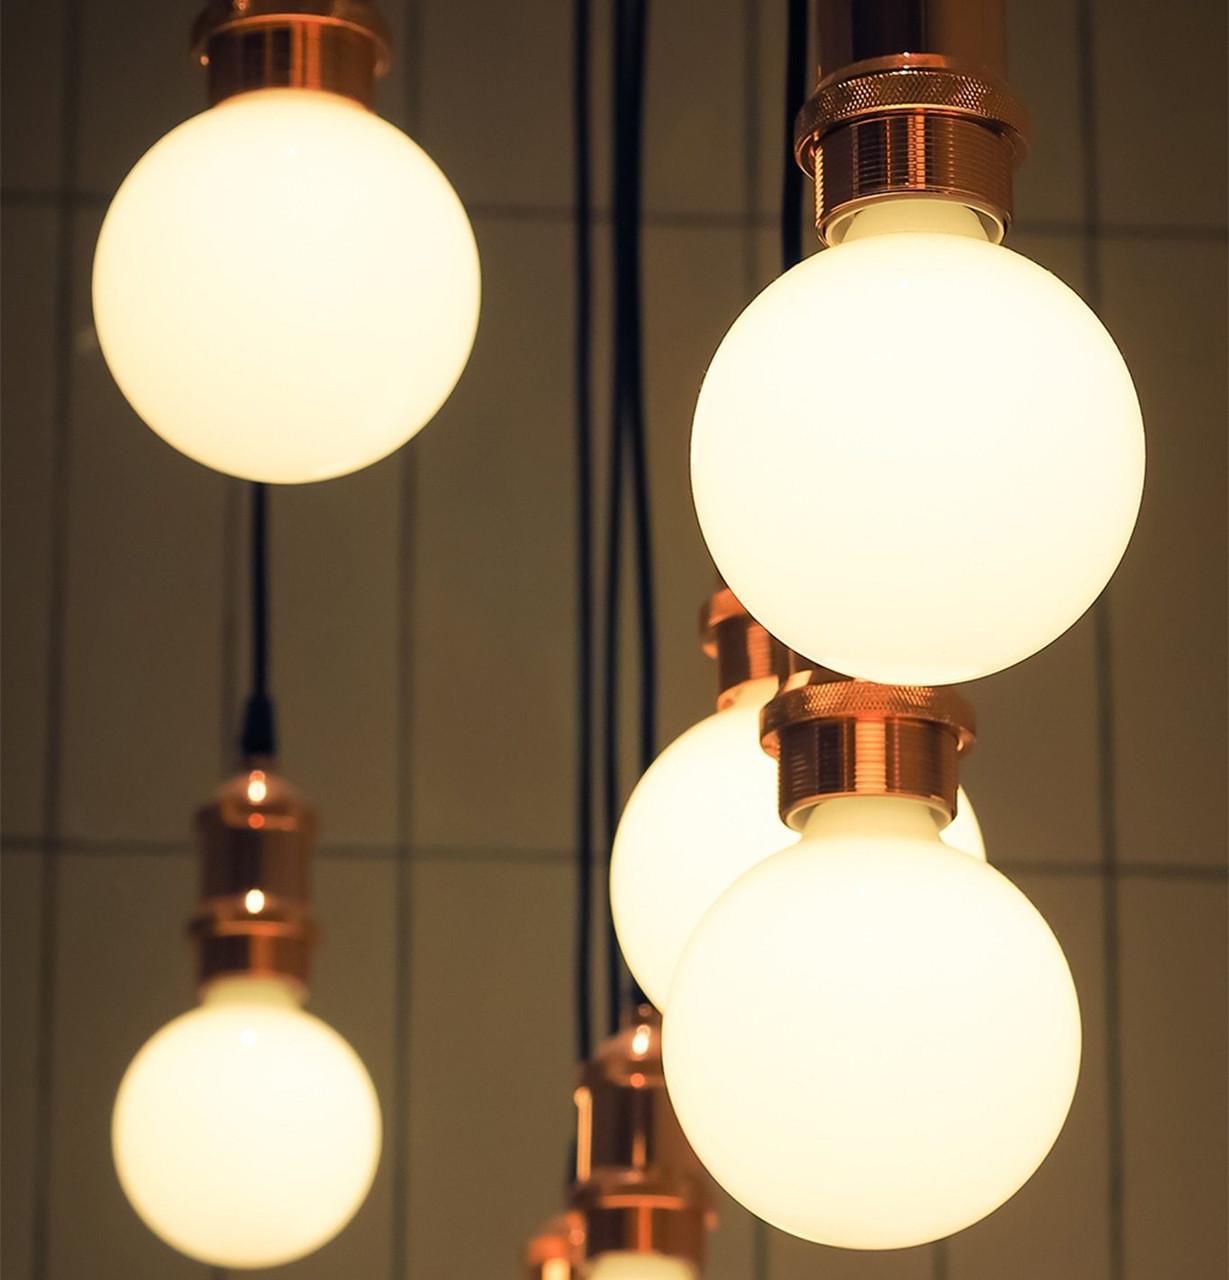 LED Globe Antique Bronze Light Bulbs